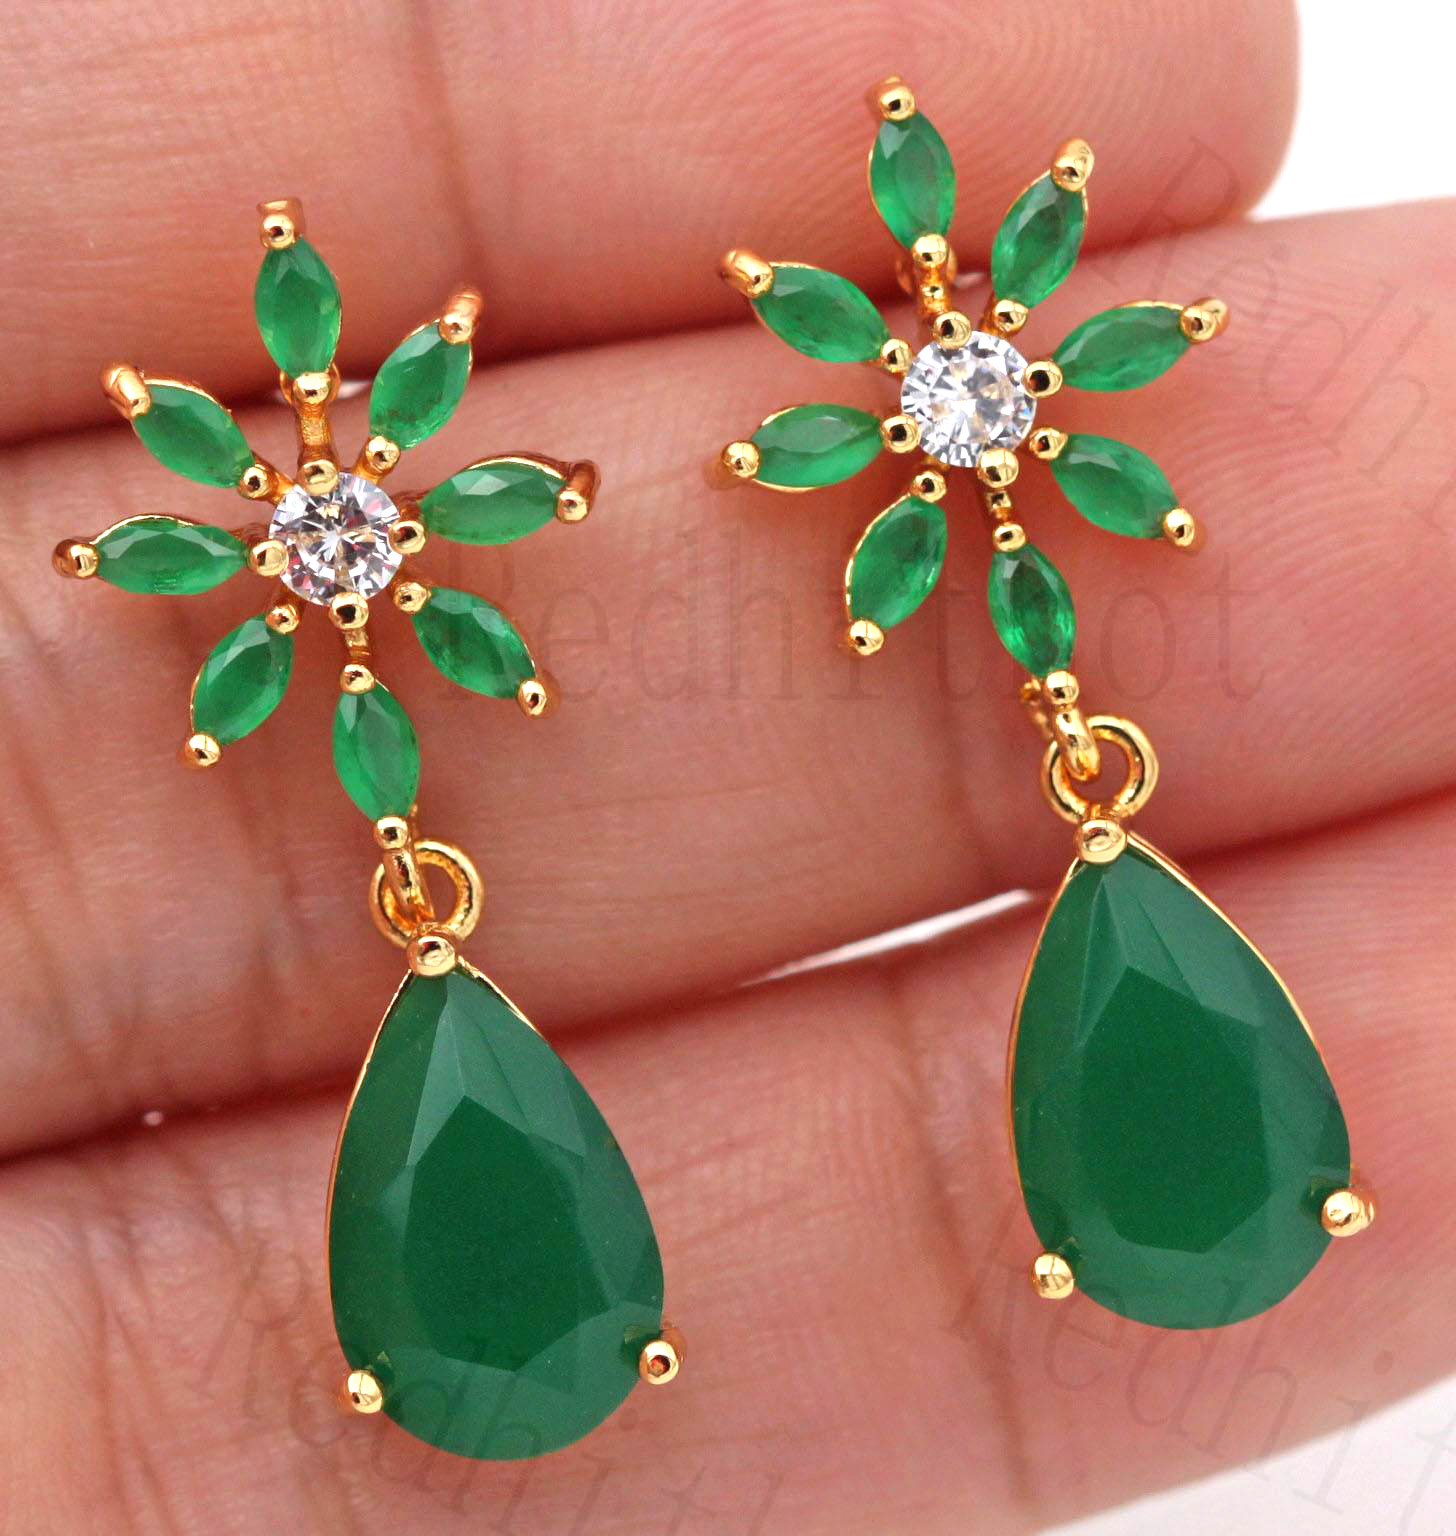 New Sun Flower Stud Earrings For Women Waterdrop Earring With Green Zircon Luxury Statement Jewelry For Wedding Engagement Gift